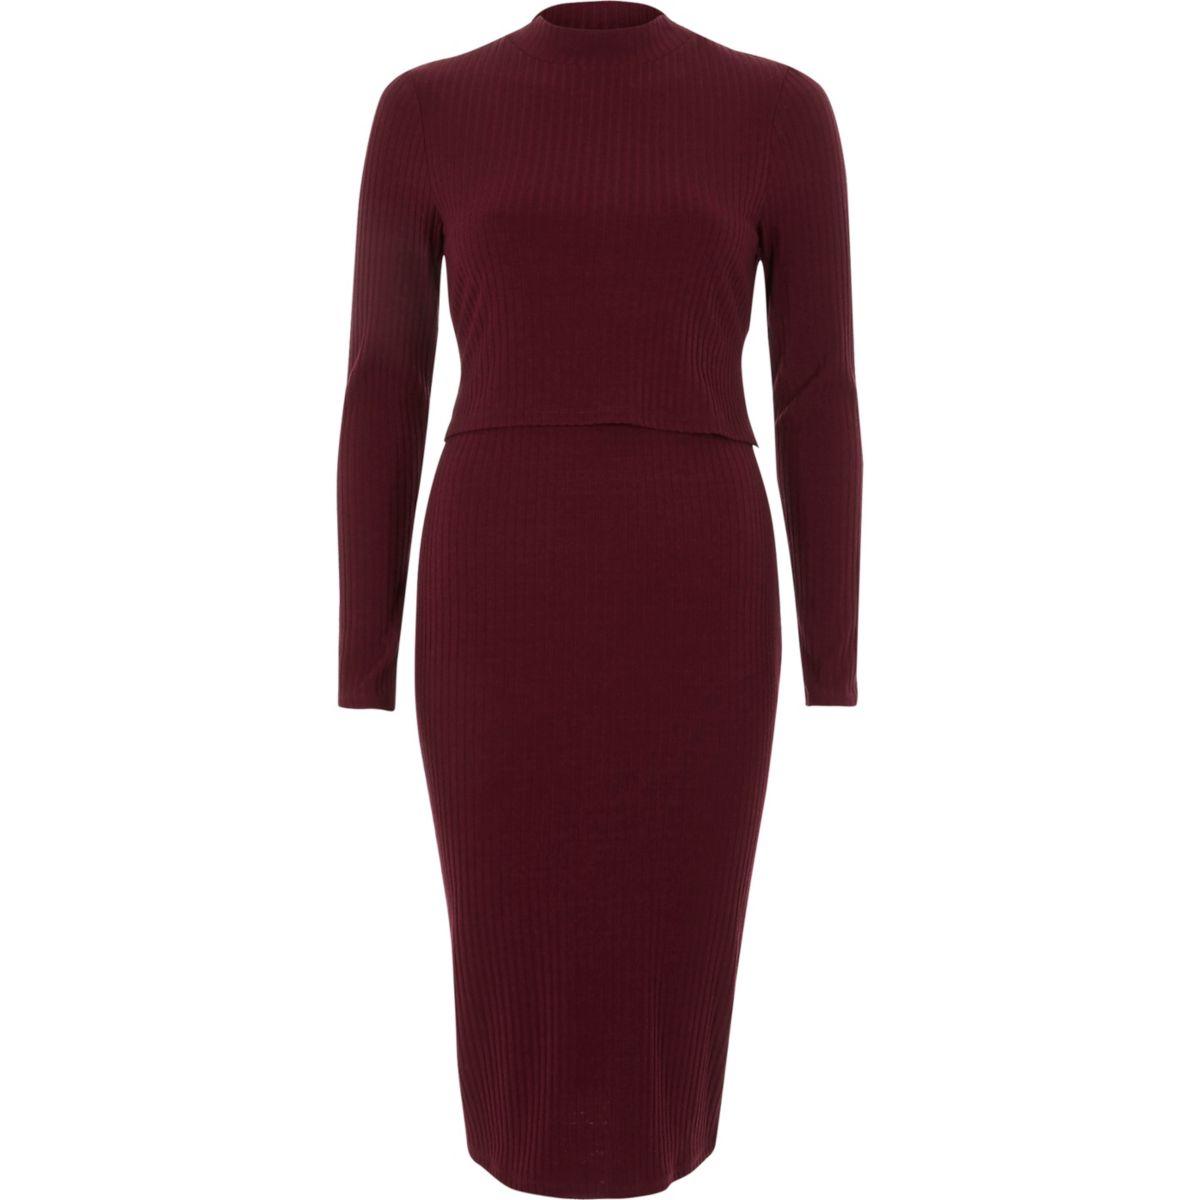 Donkerrode geribbelde bodycon midi-jurk met dubbele laag